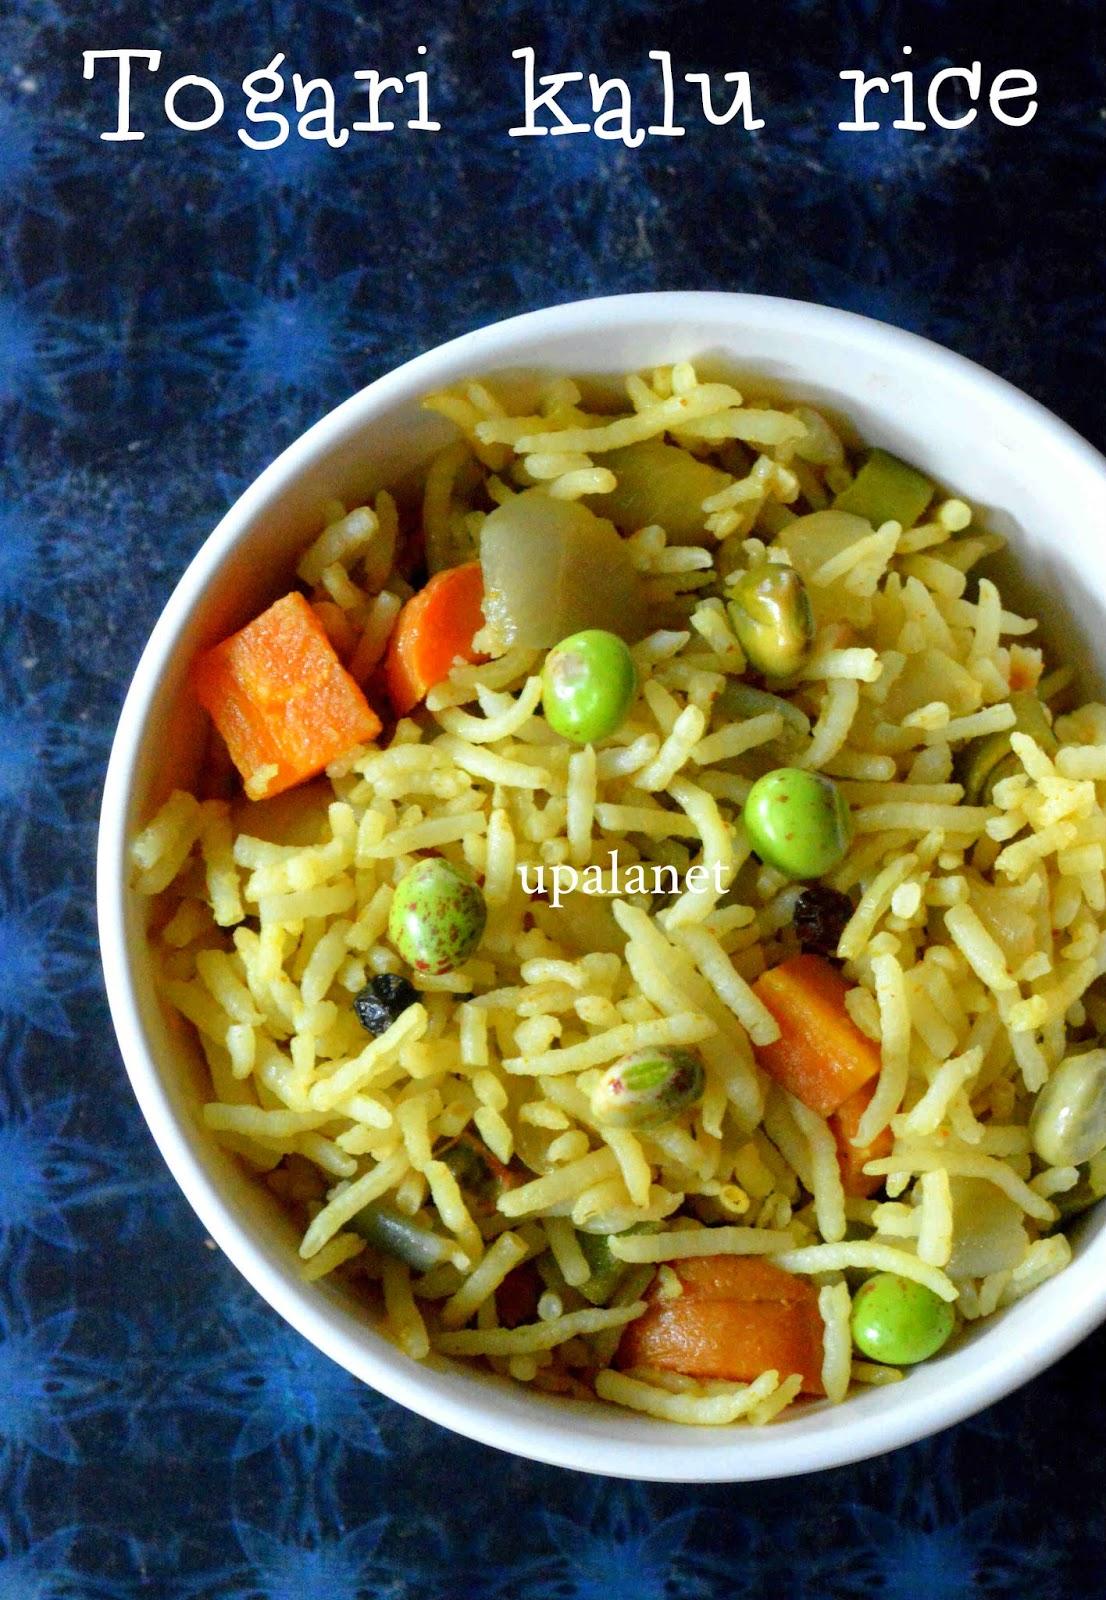 Togari kalu rice